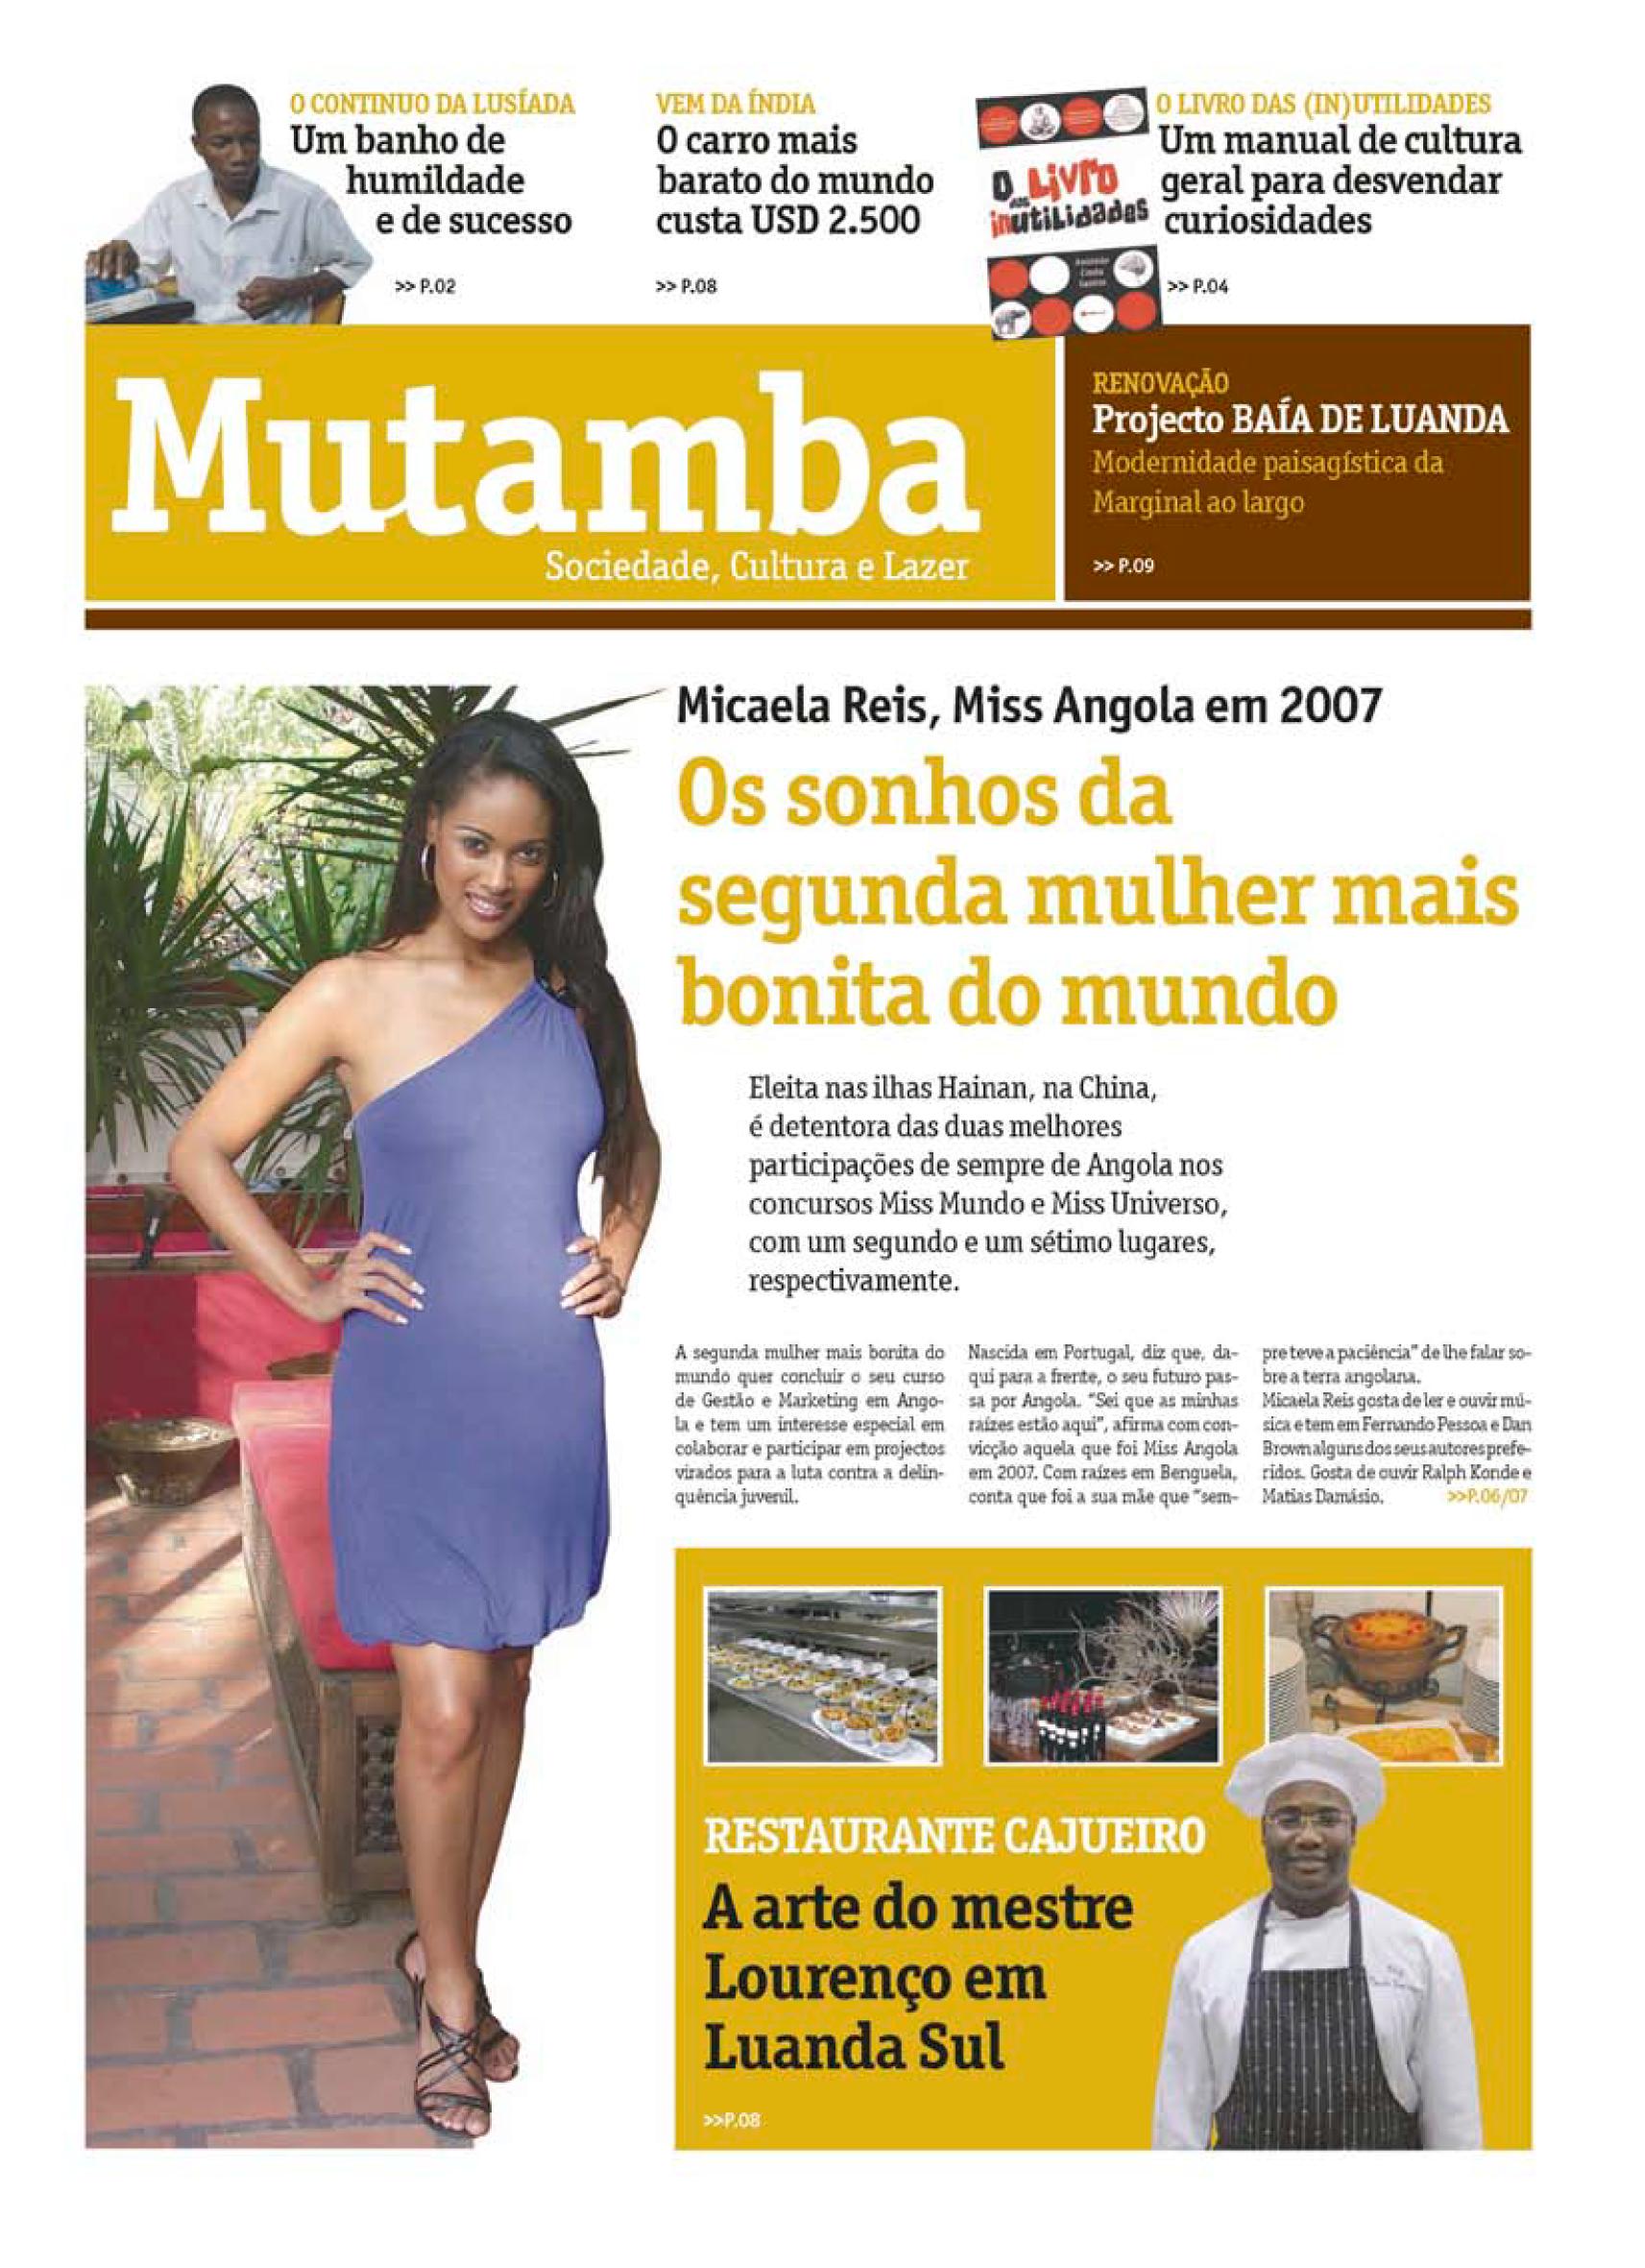 Capa do caderno Mutamba do Novo Jornal n.º 1